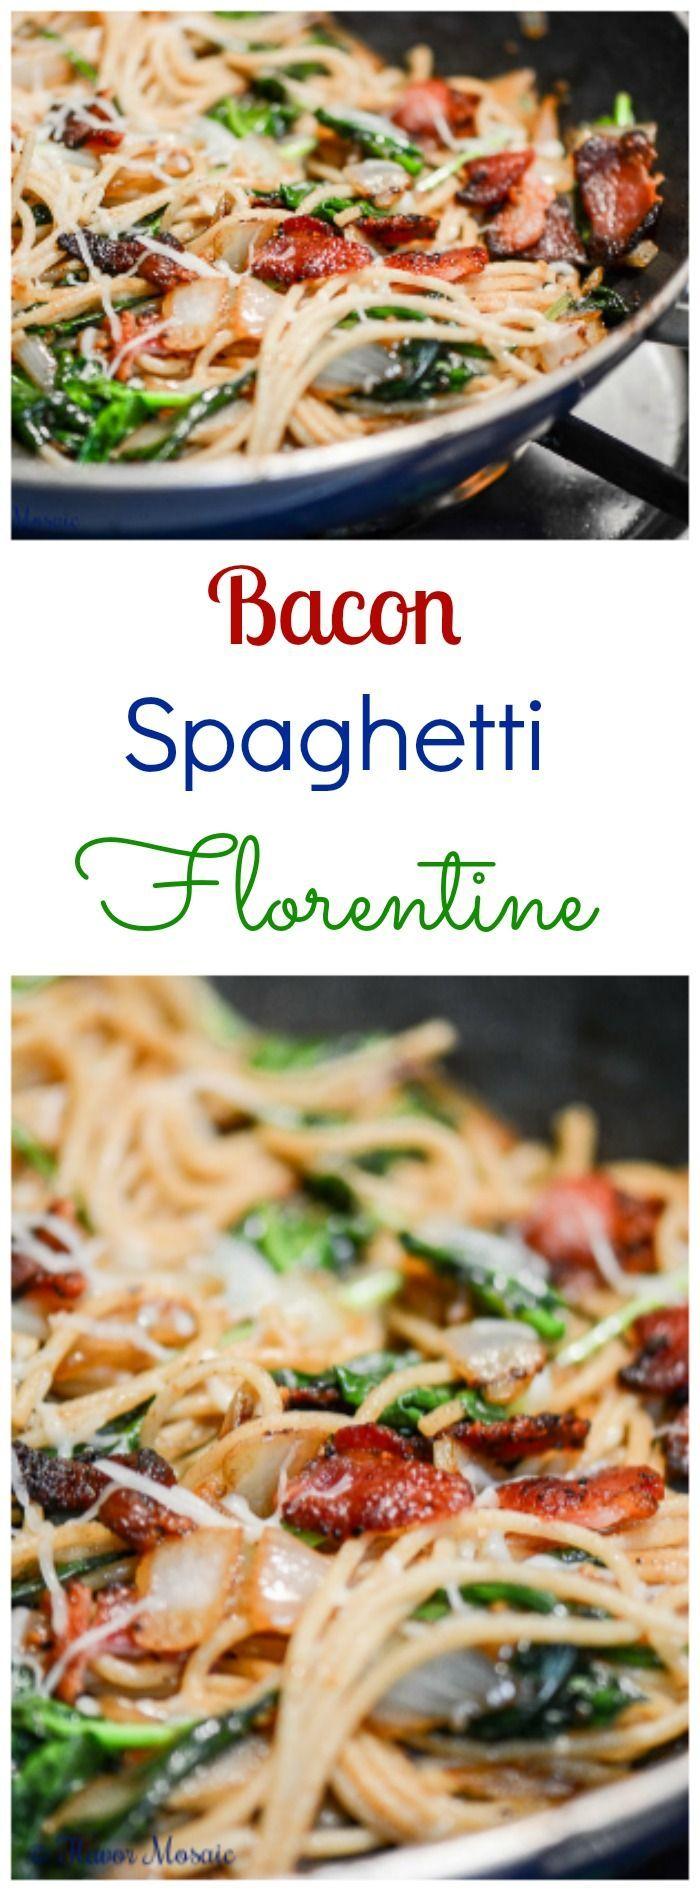 Bacon Spaghetti Florentine